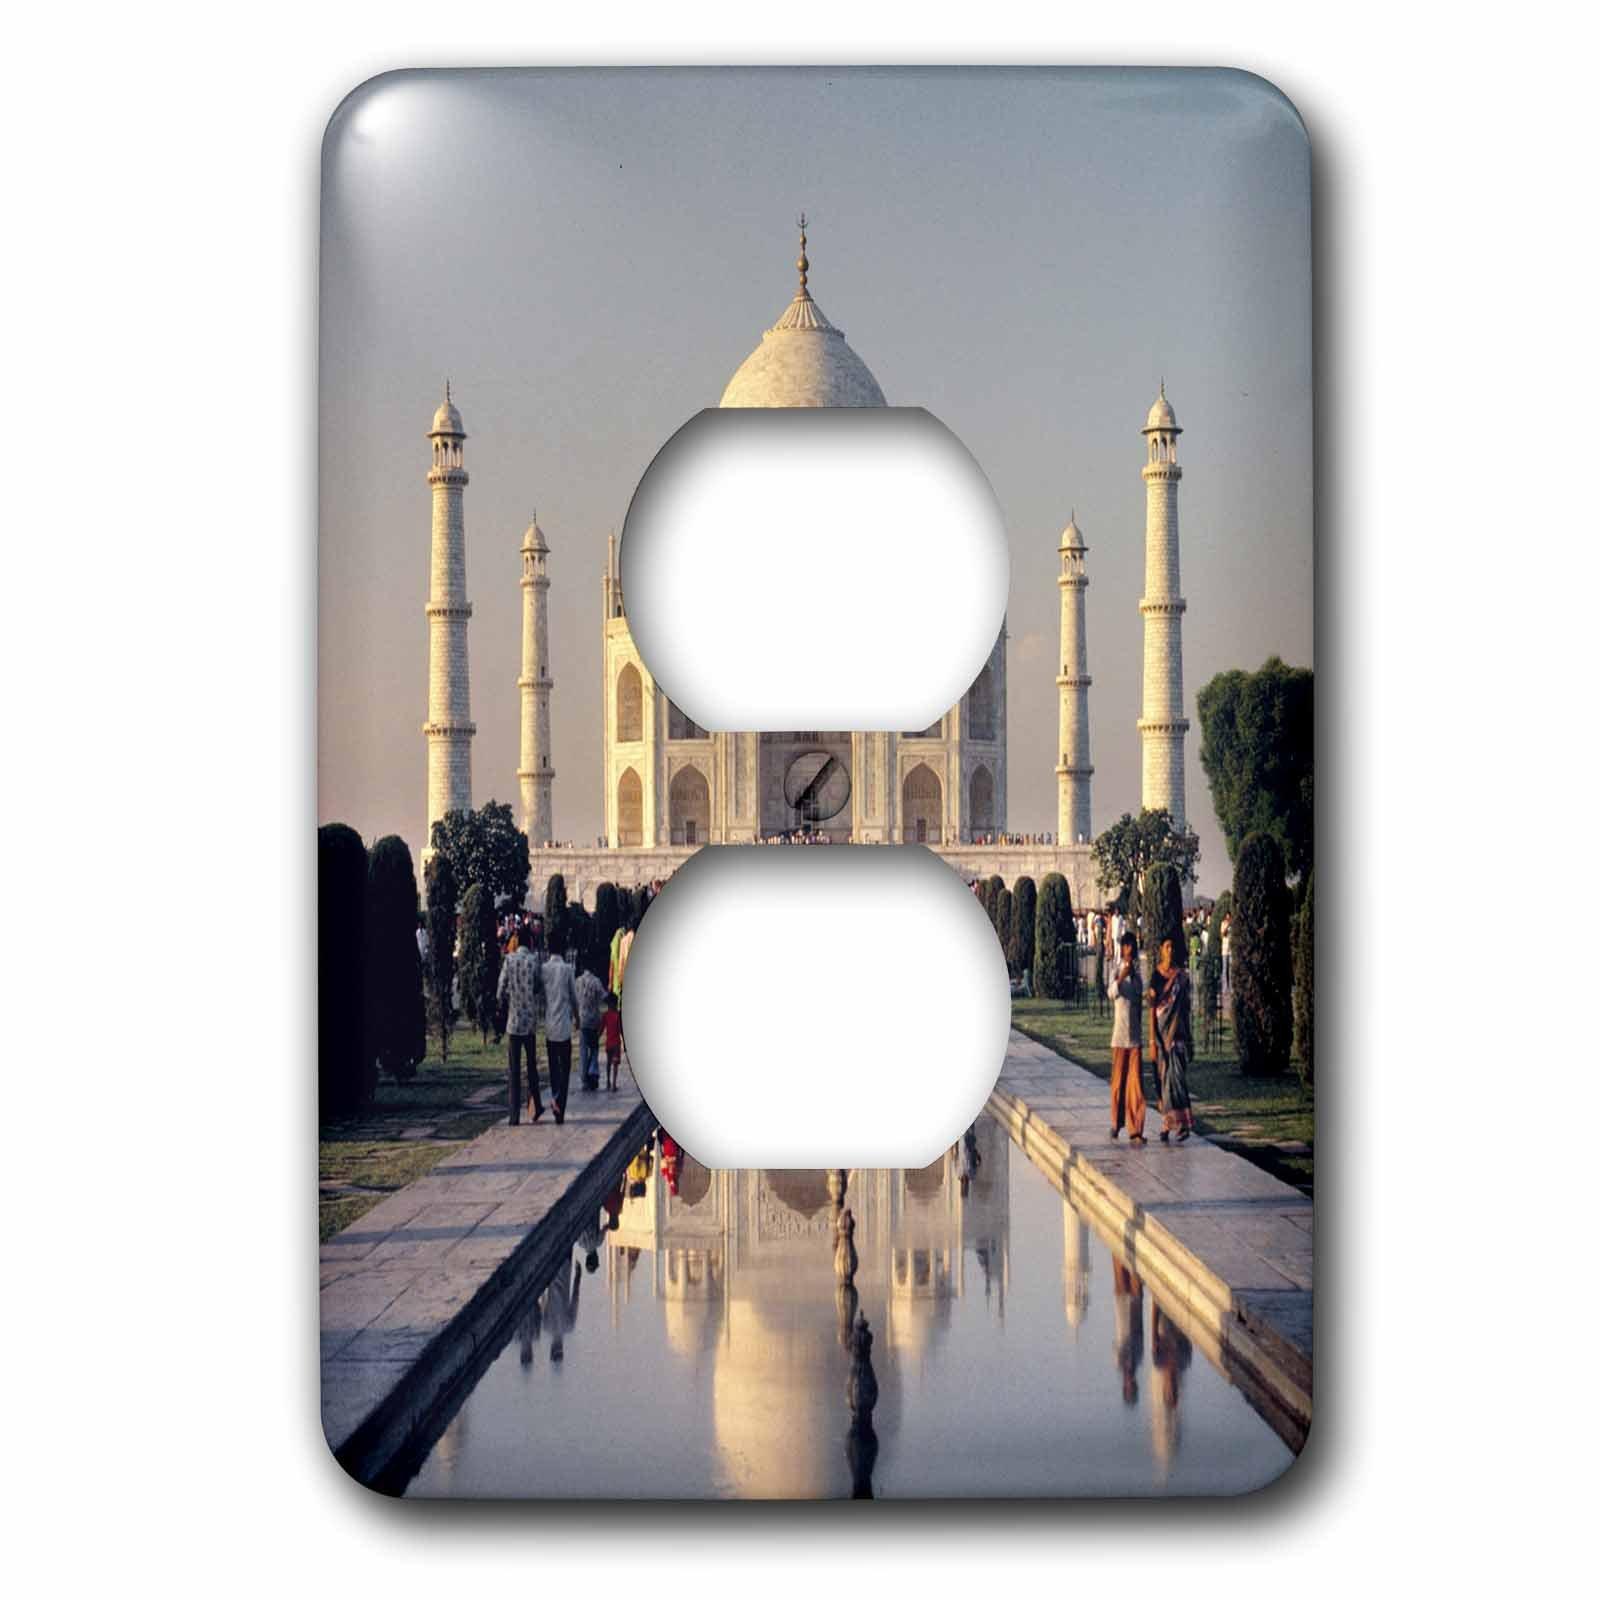 3dRose LLC lsp_75432_6 India, Uttar Pradesh, Agra, Taj Mahalas10 Rer0032 Ric Ergenbright 2 Plug Outlet Cover